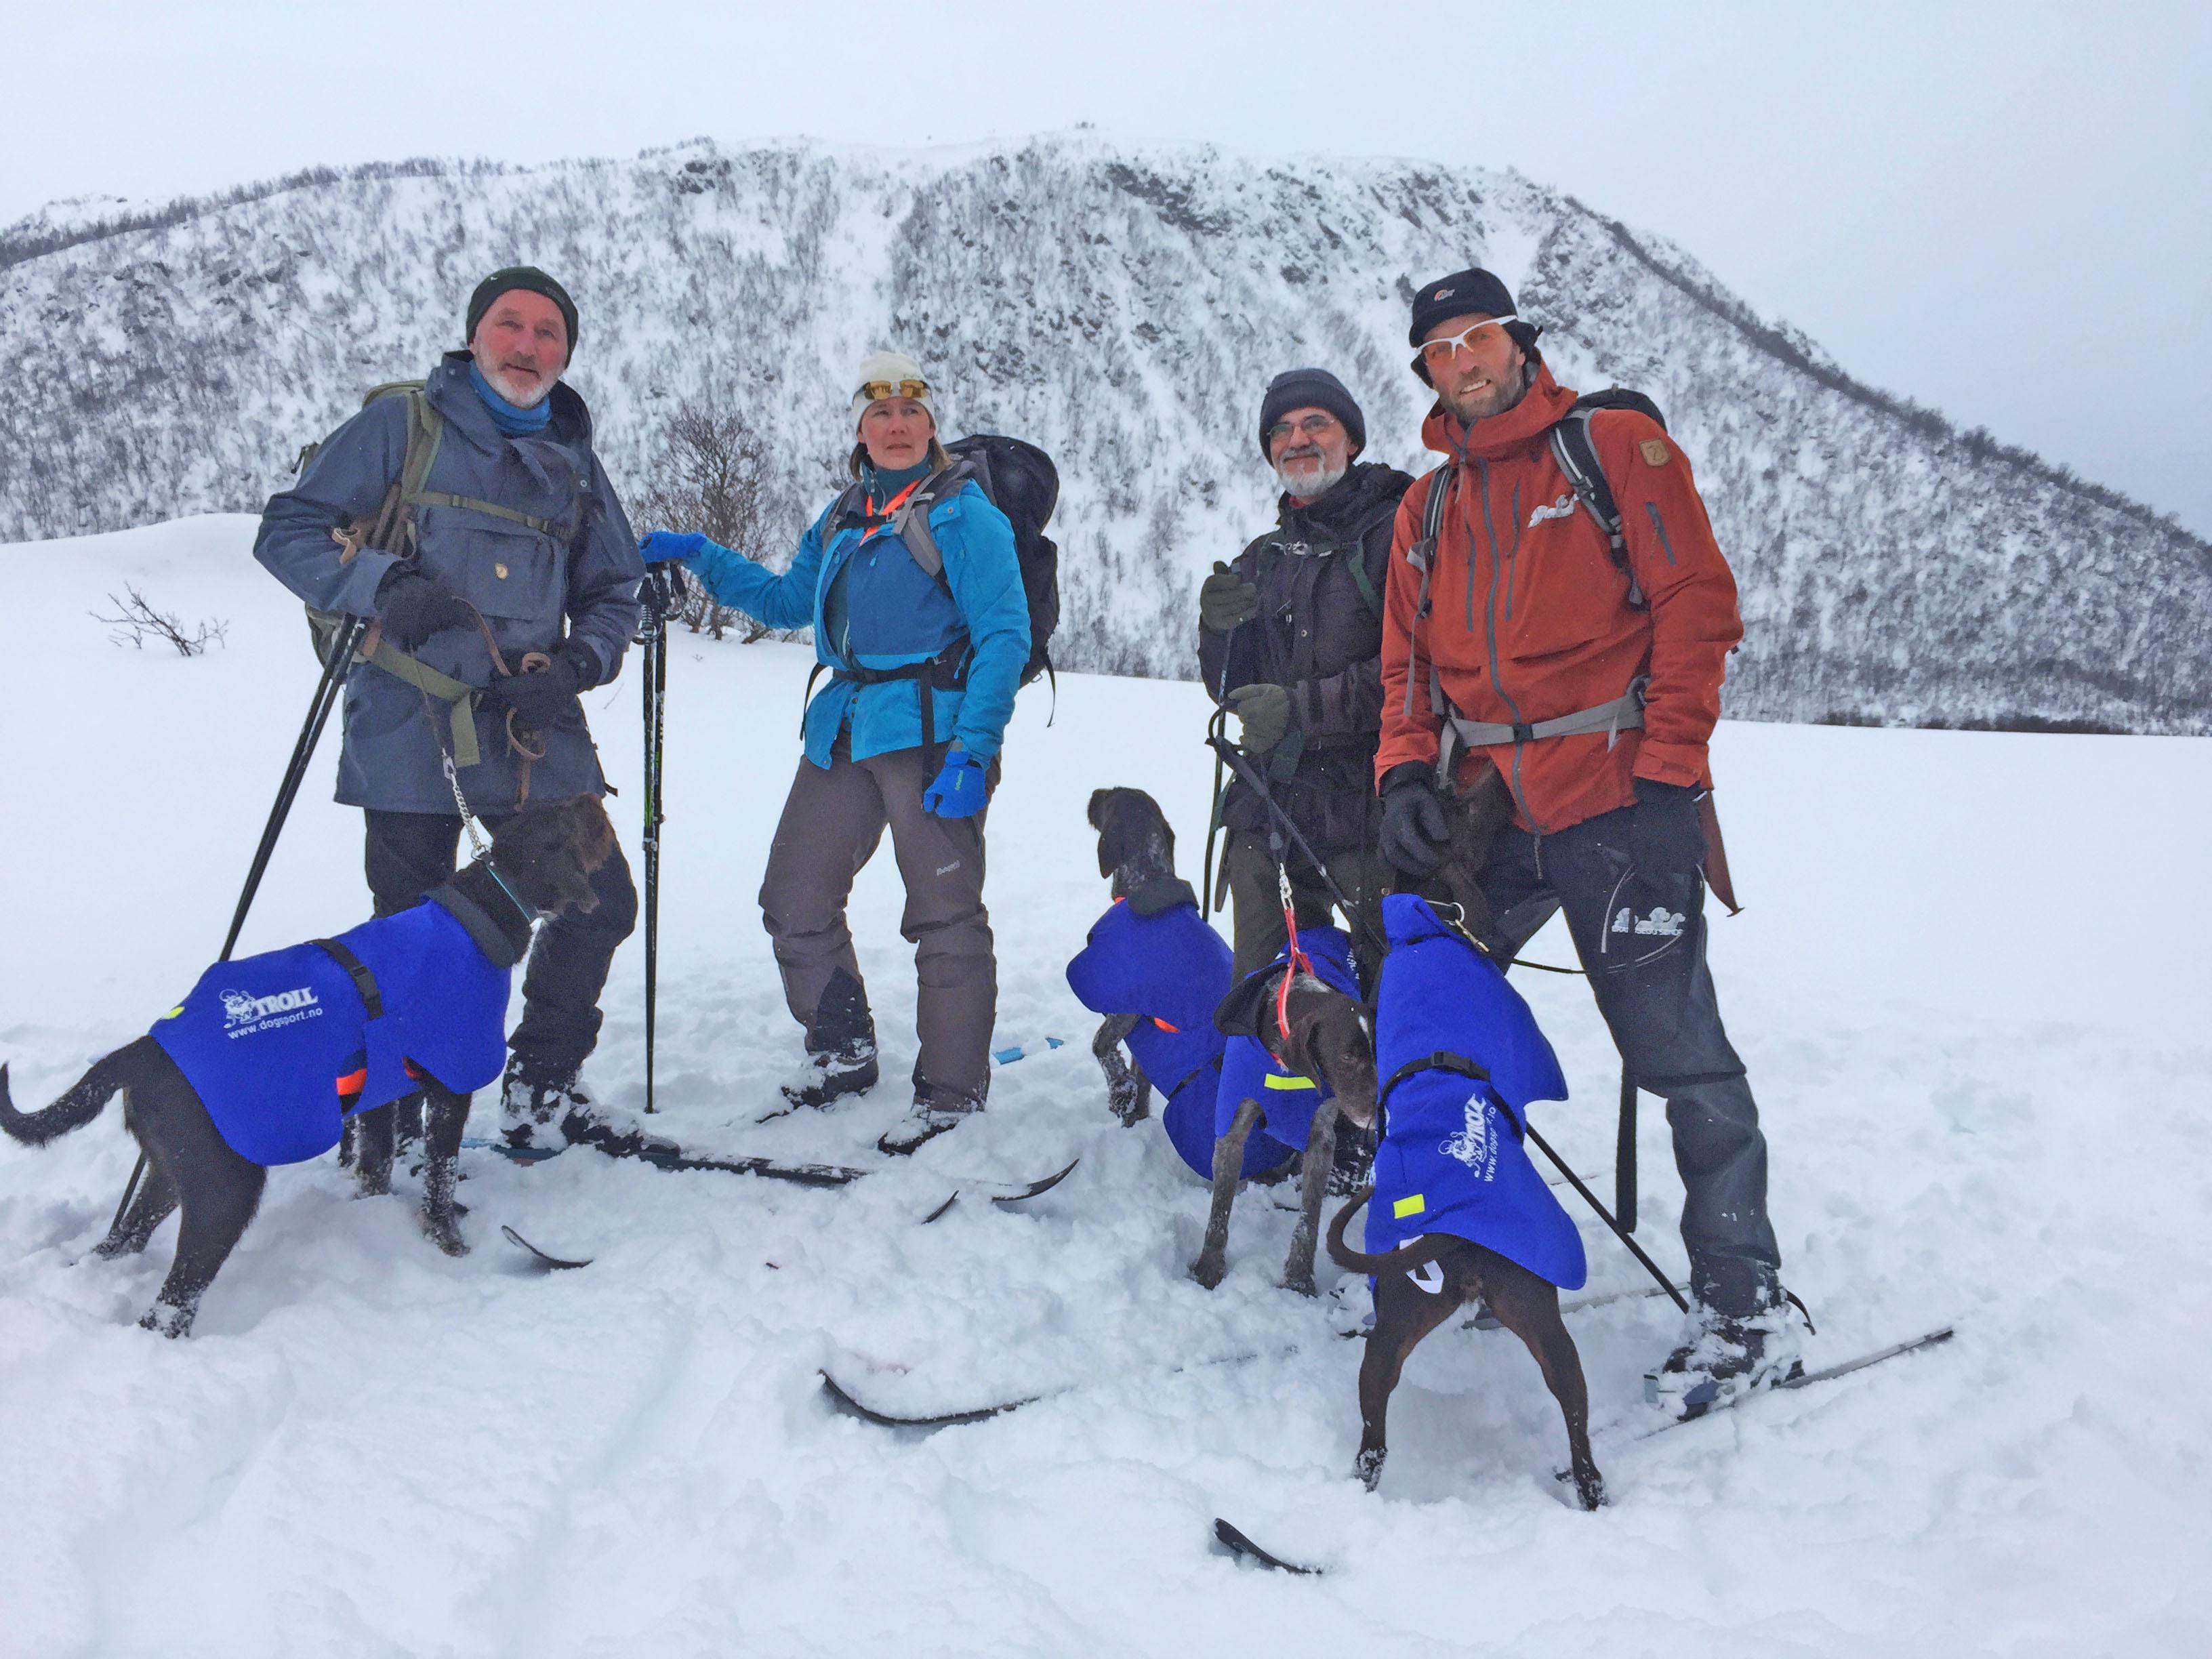 SV laget NM: Sigmund Nyborg, Trude Langstrand, Torgeir Dahl, Rune Fossum